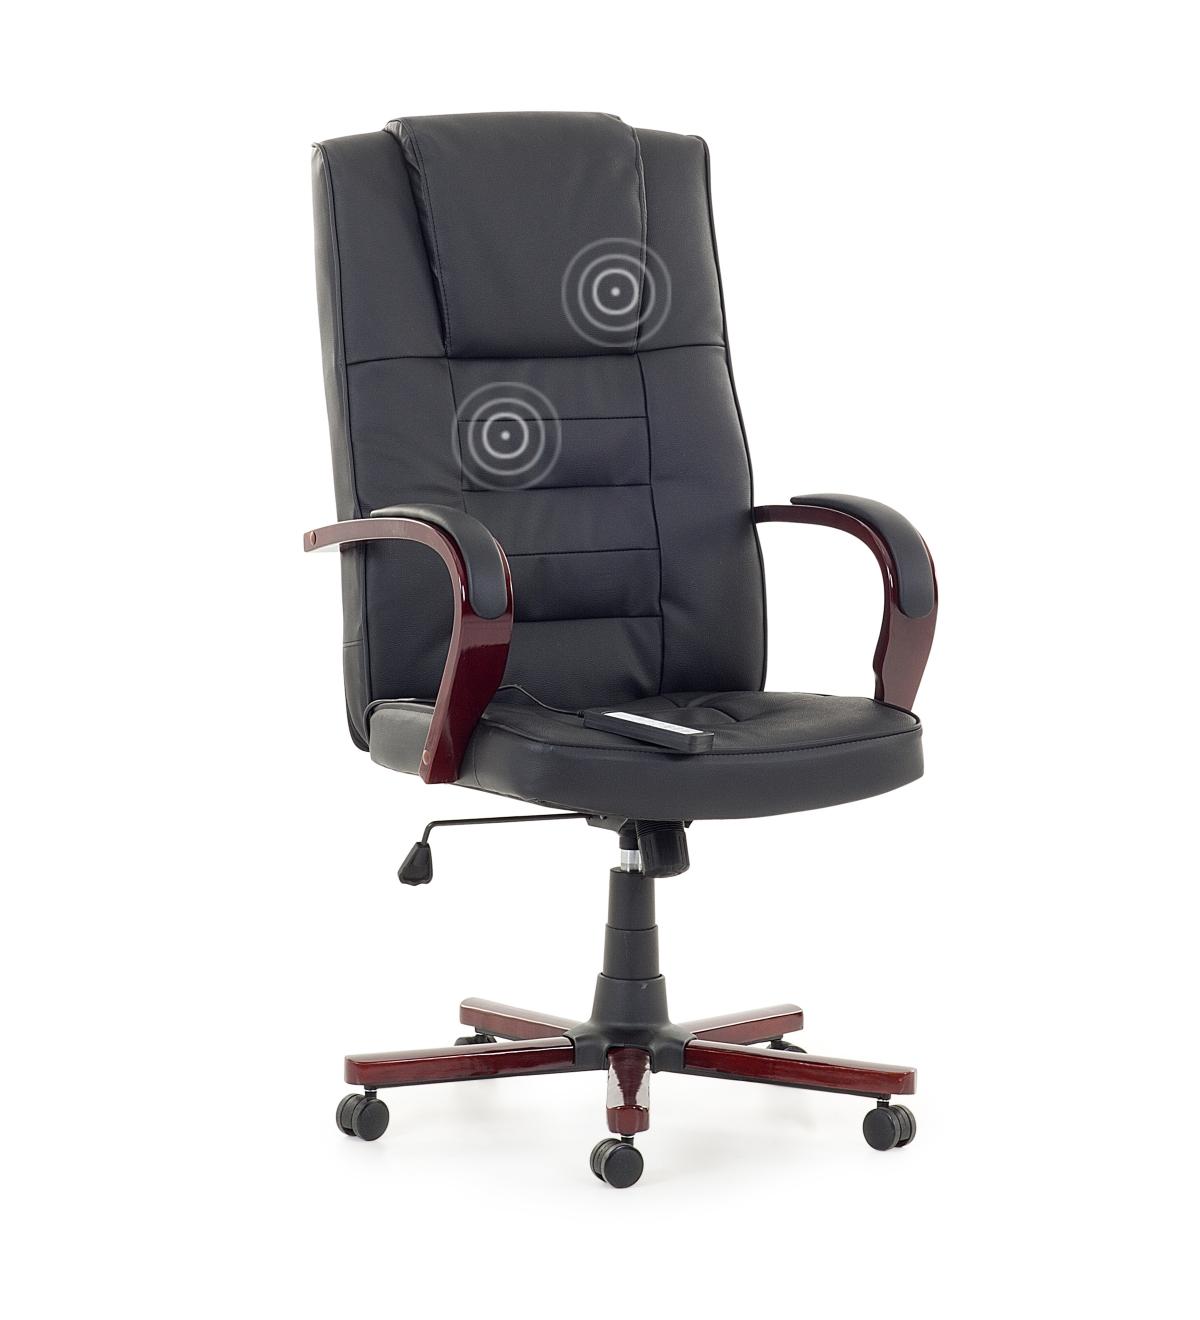 Chefsessel Massagesessel Bürostuhl Leder Sessel Büro beige weiß mit Massage Holz